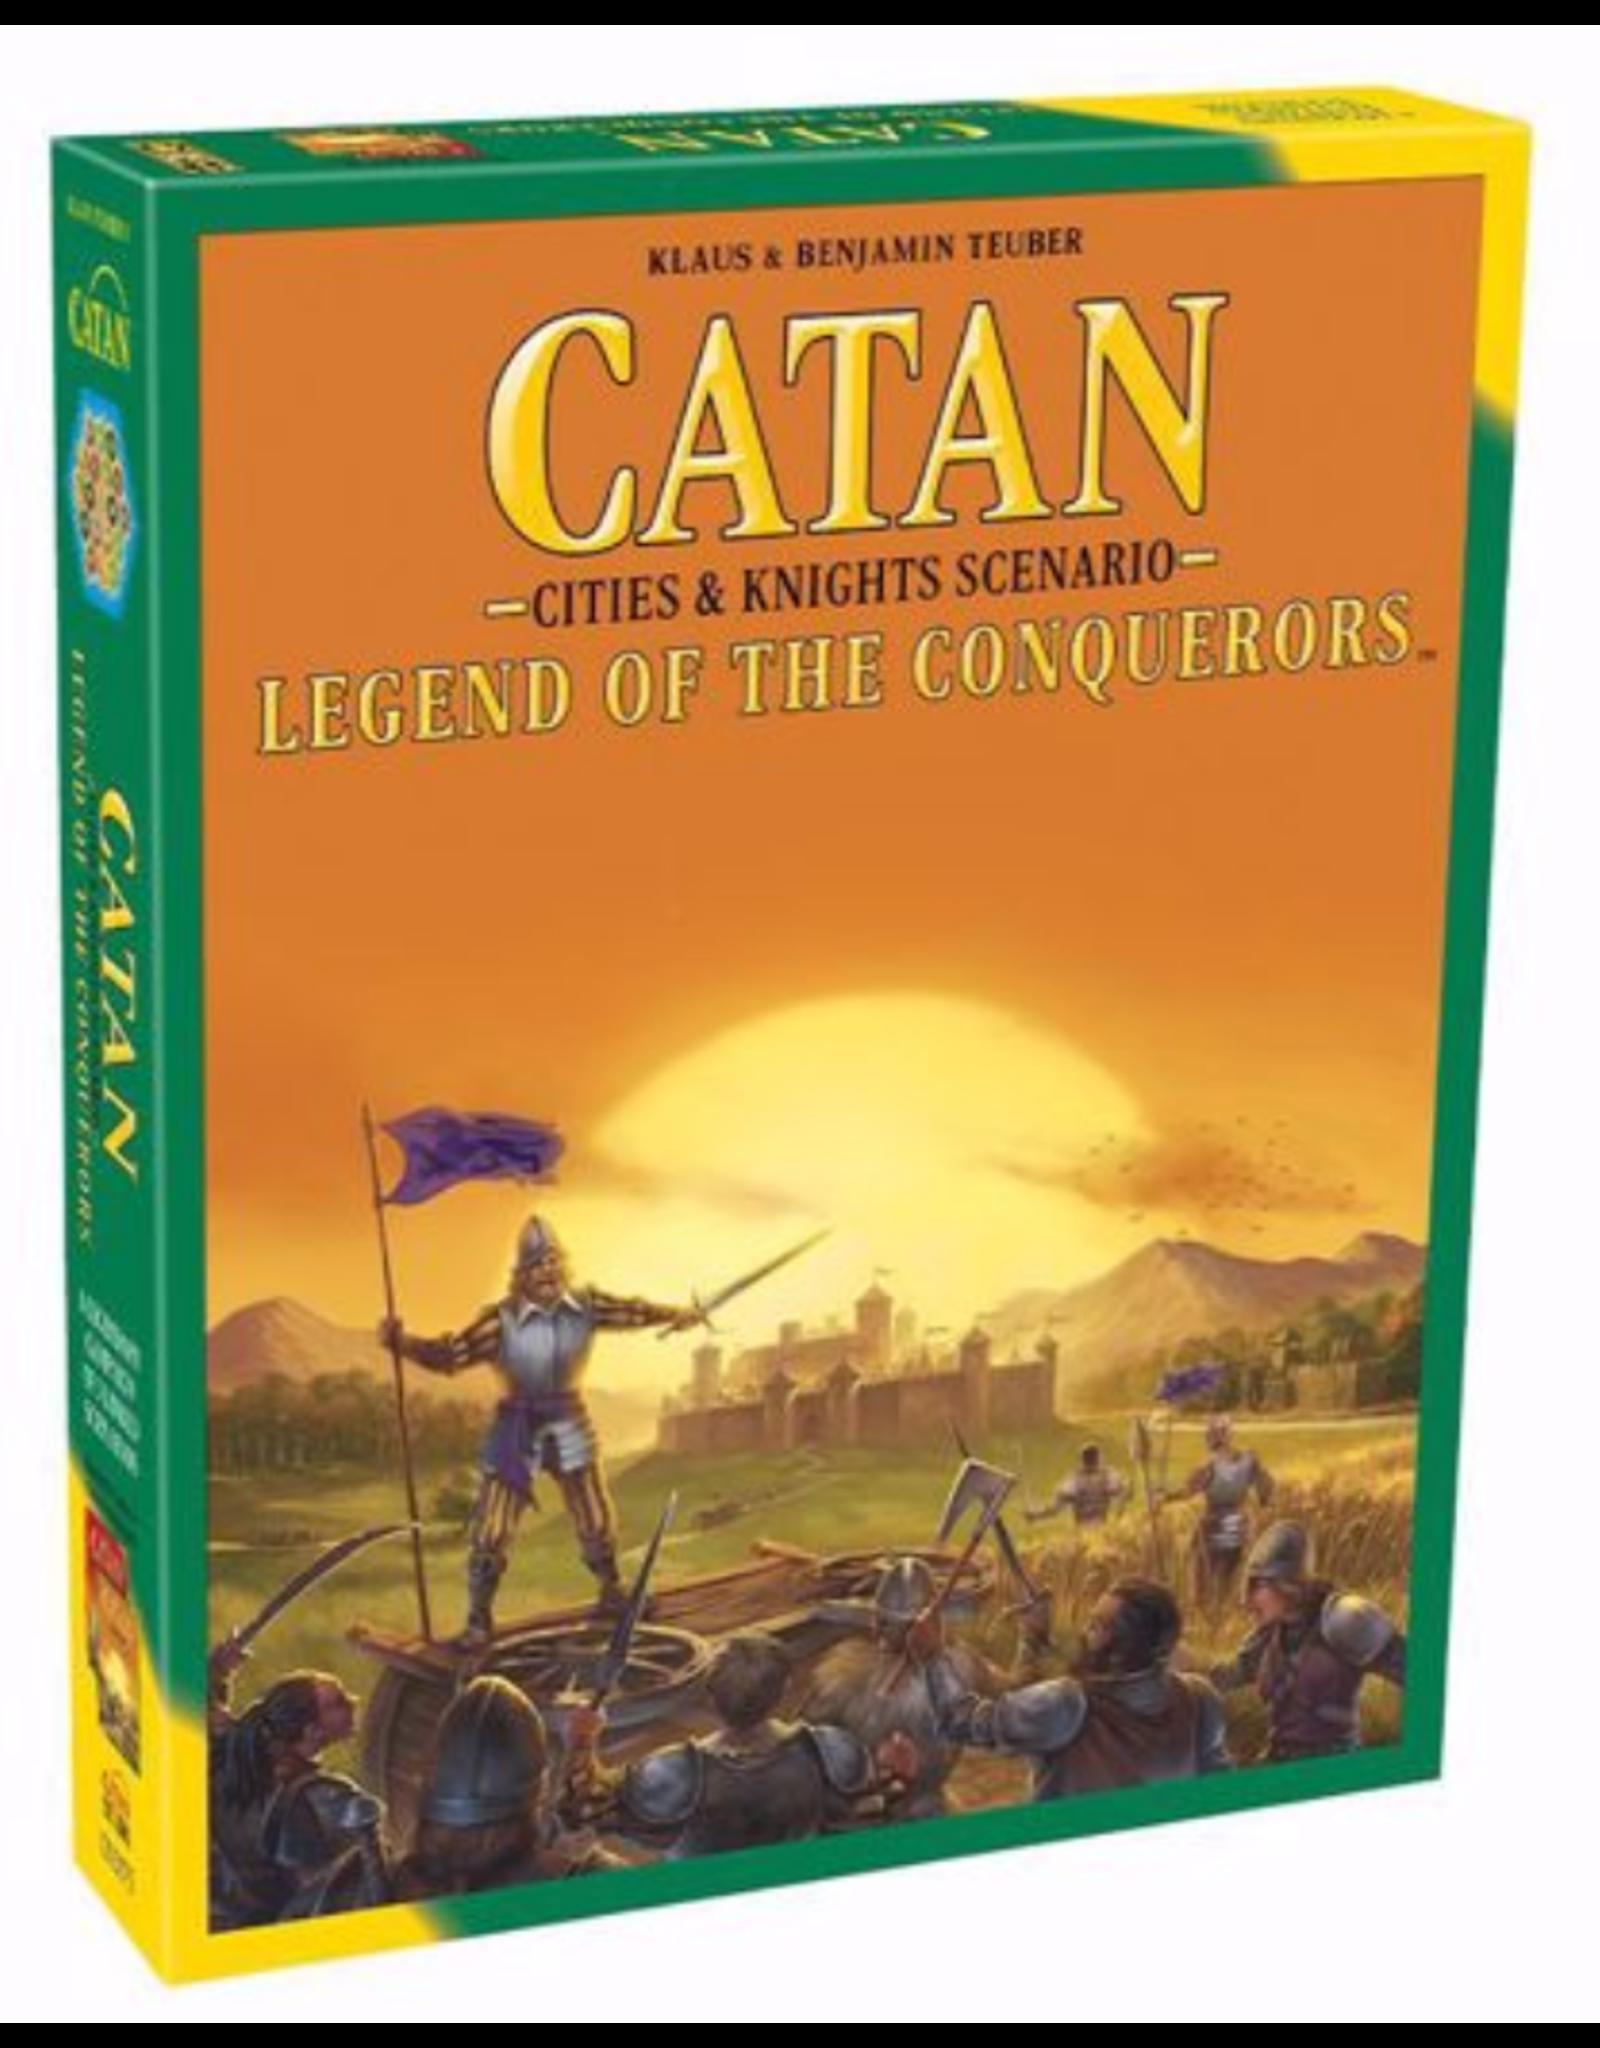 Catan Studios Catan: Legend of the Conquerers Expansion